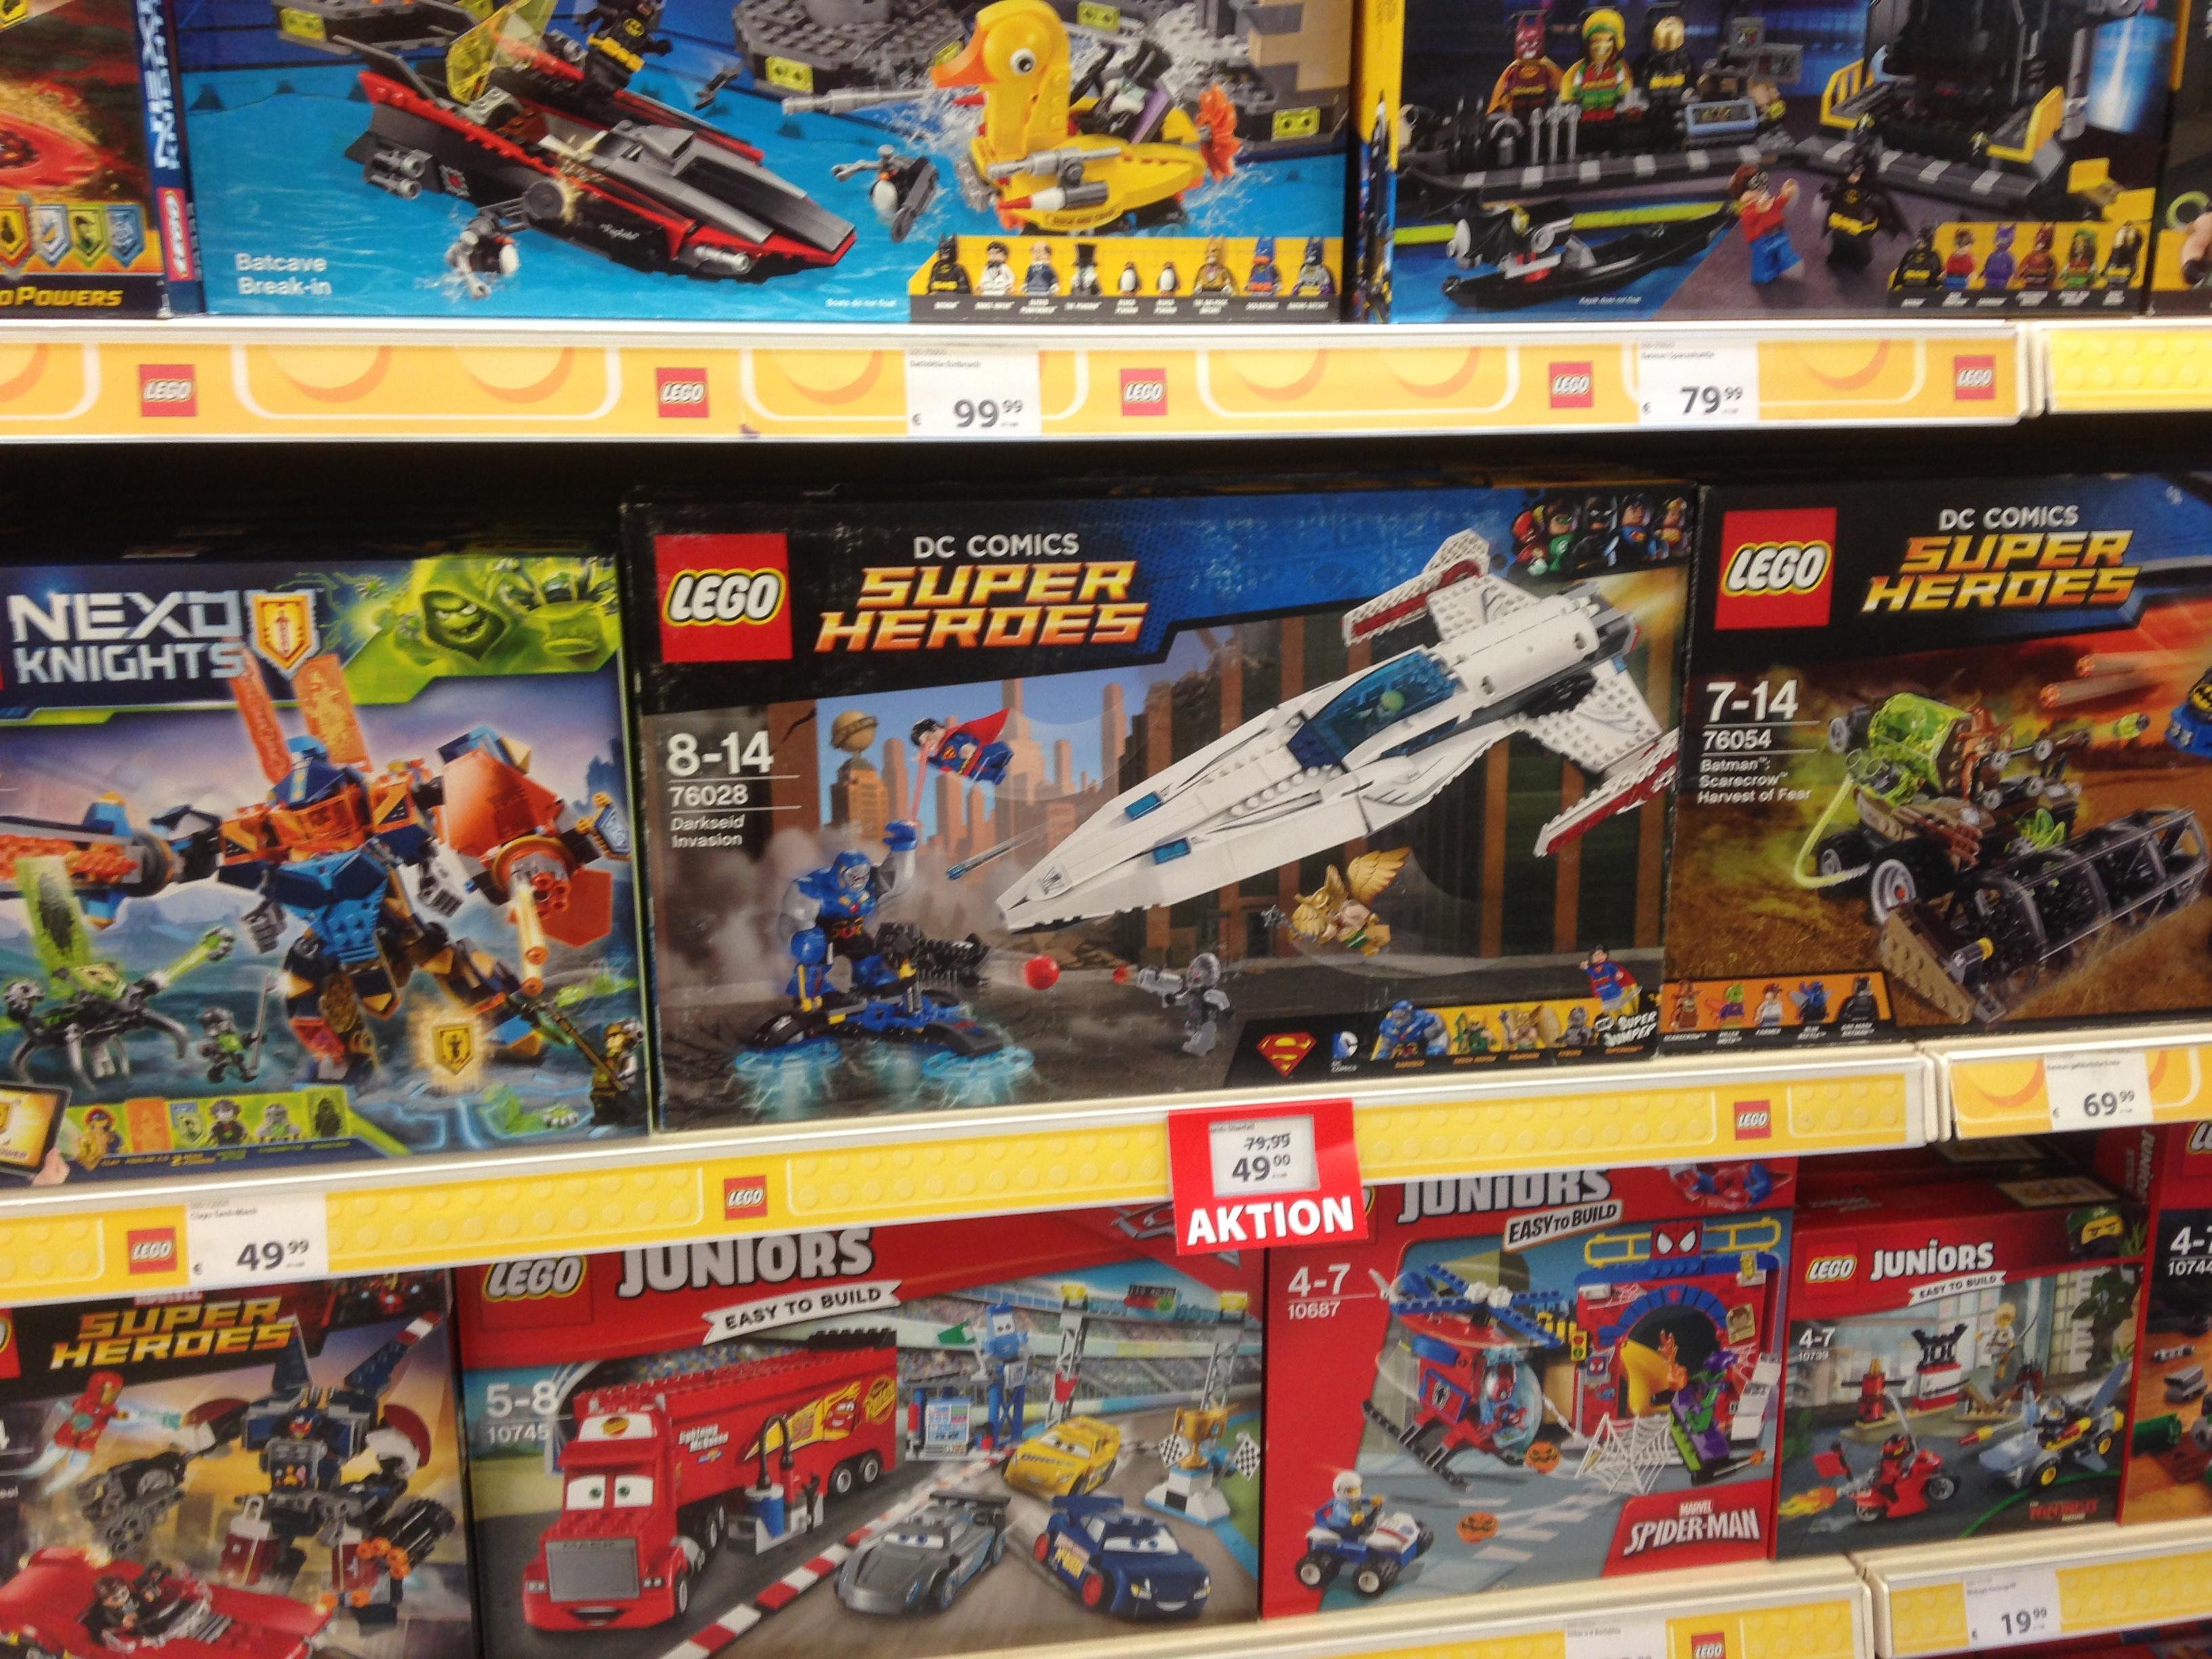 [Lokal - Spiele Max Schwerin] LEGO DC Comics Super Heroes - Darkseids Überfall (76028)